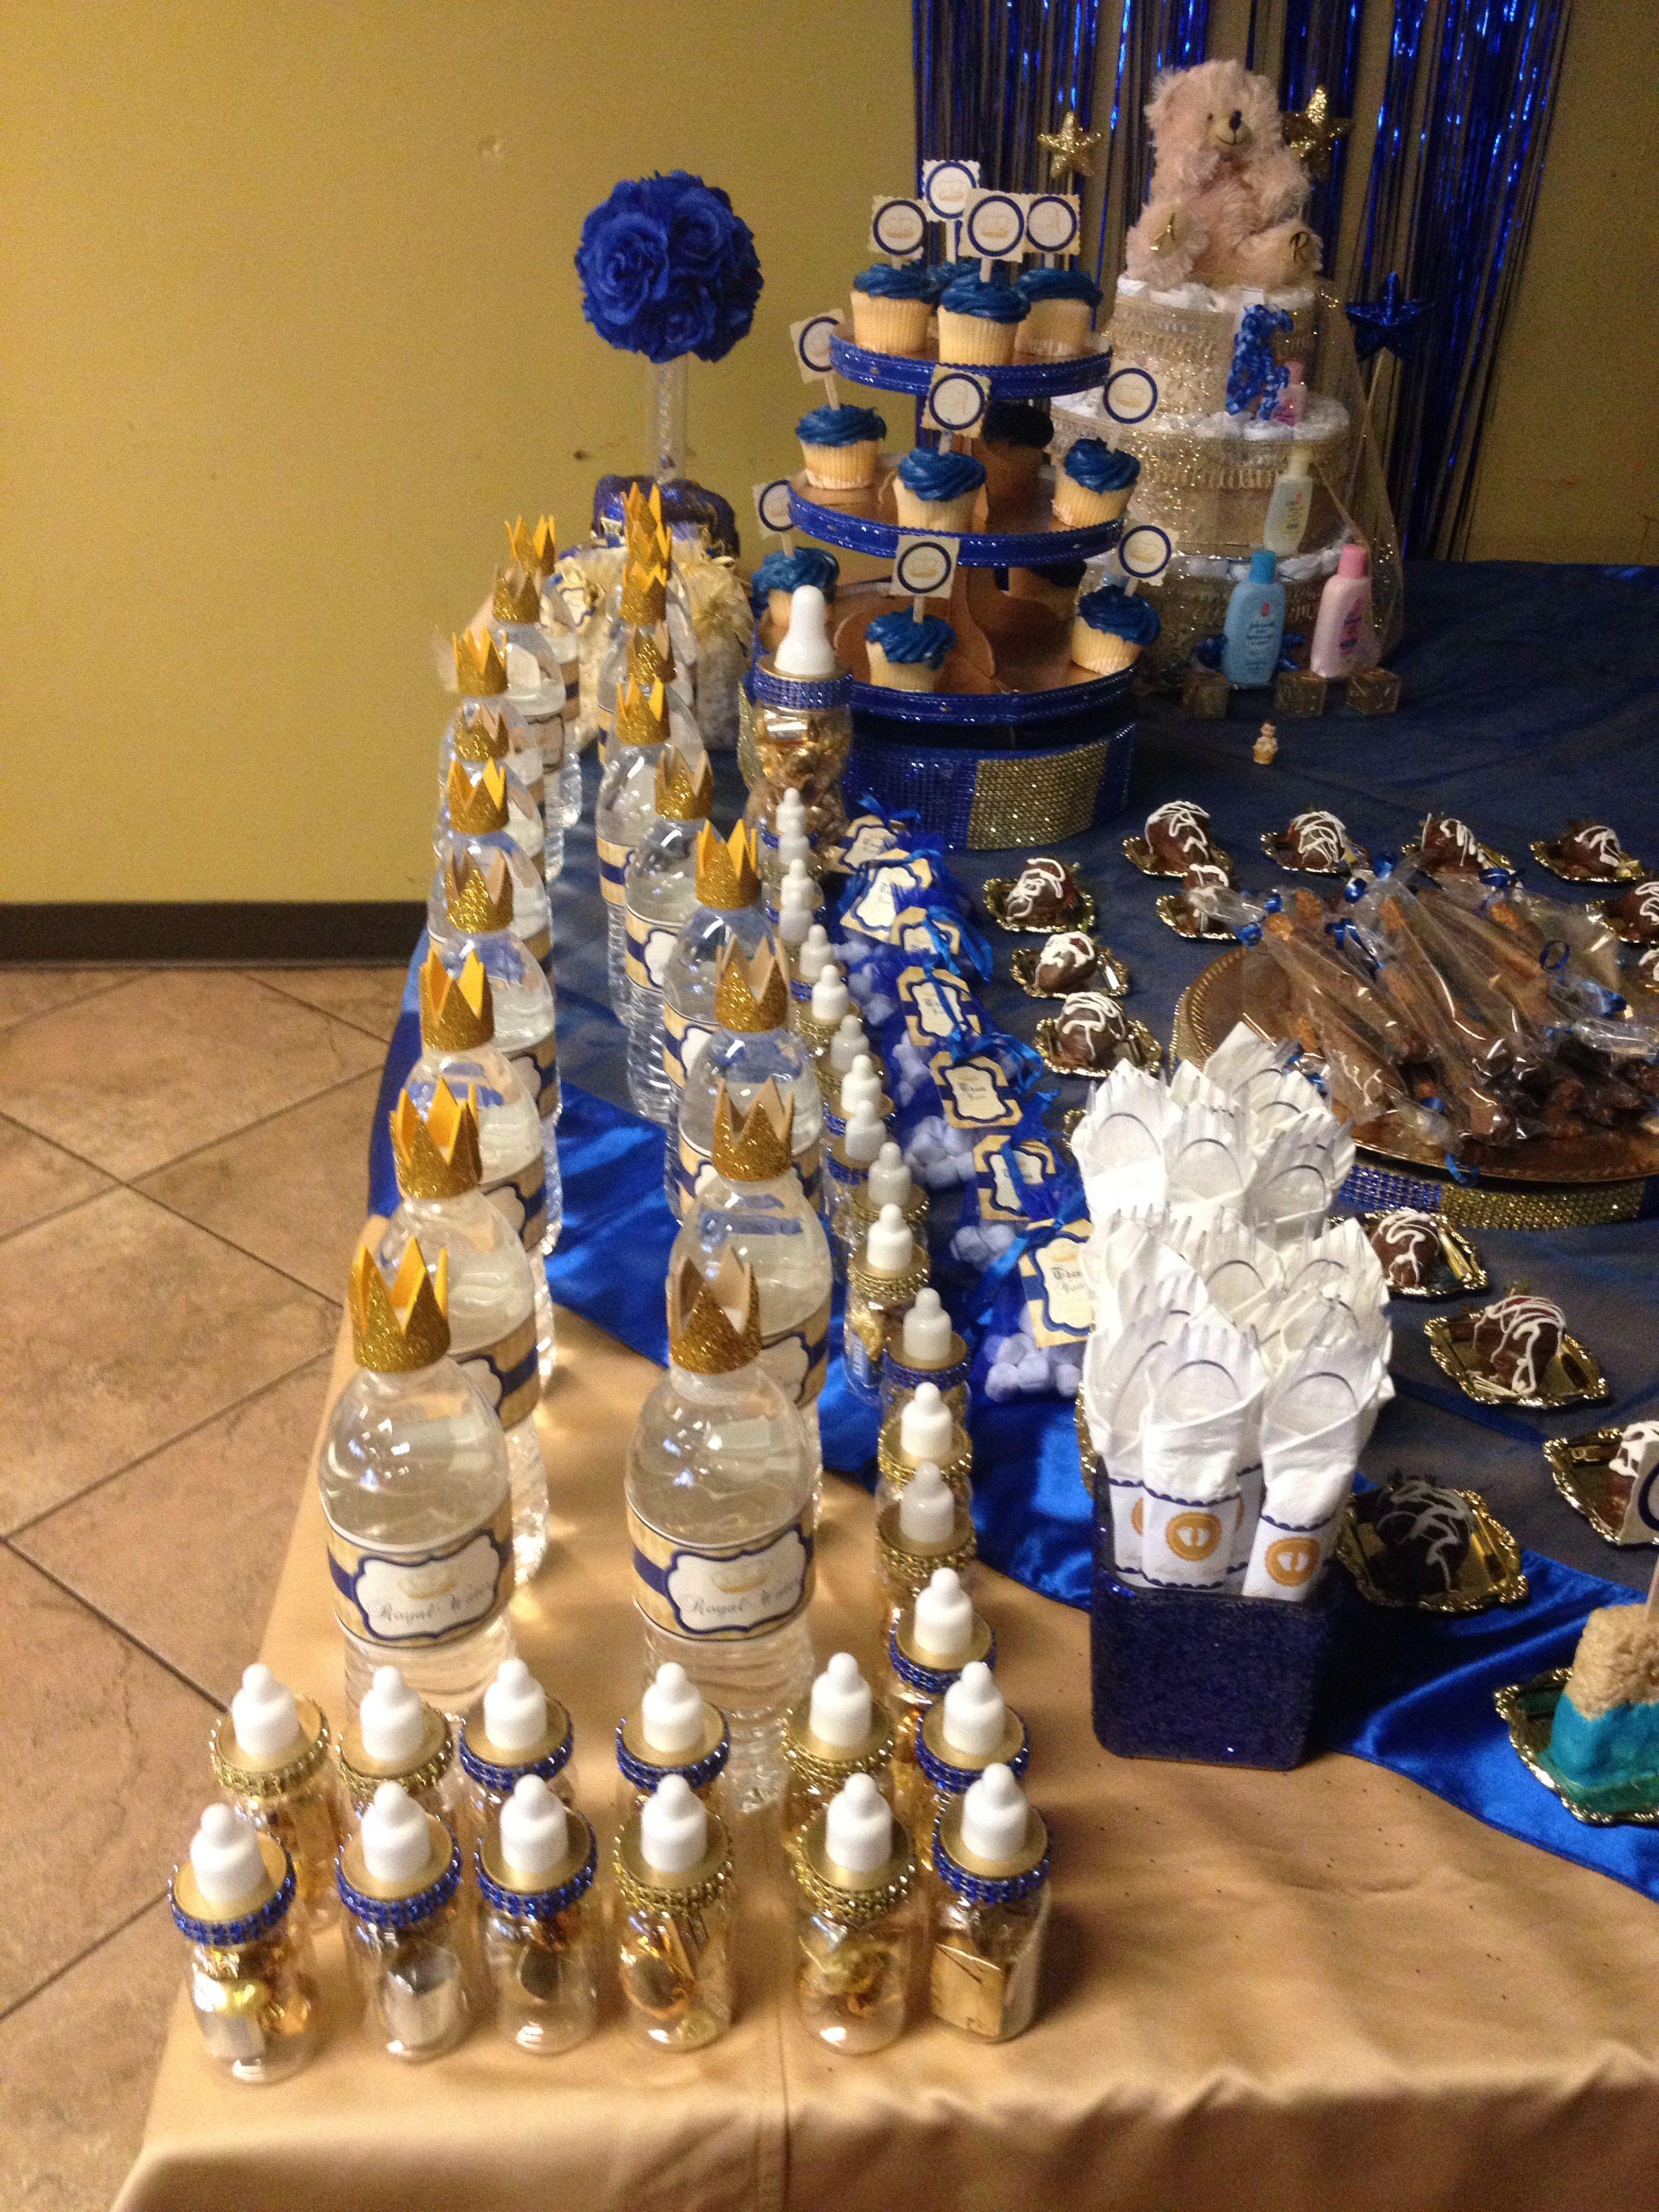 desert table for royal price theme baby shower